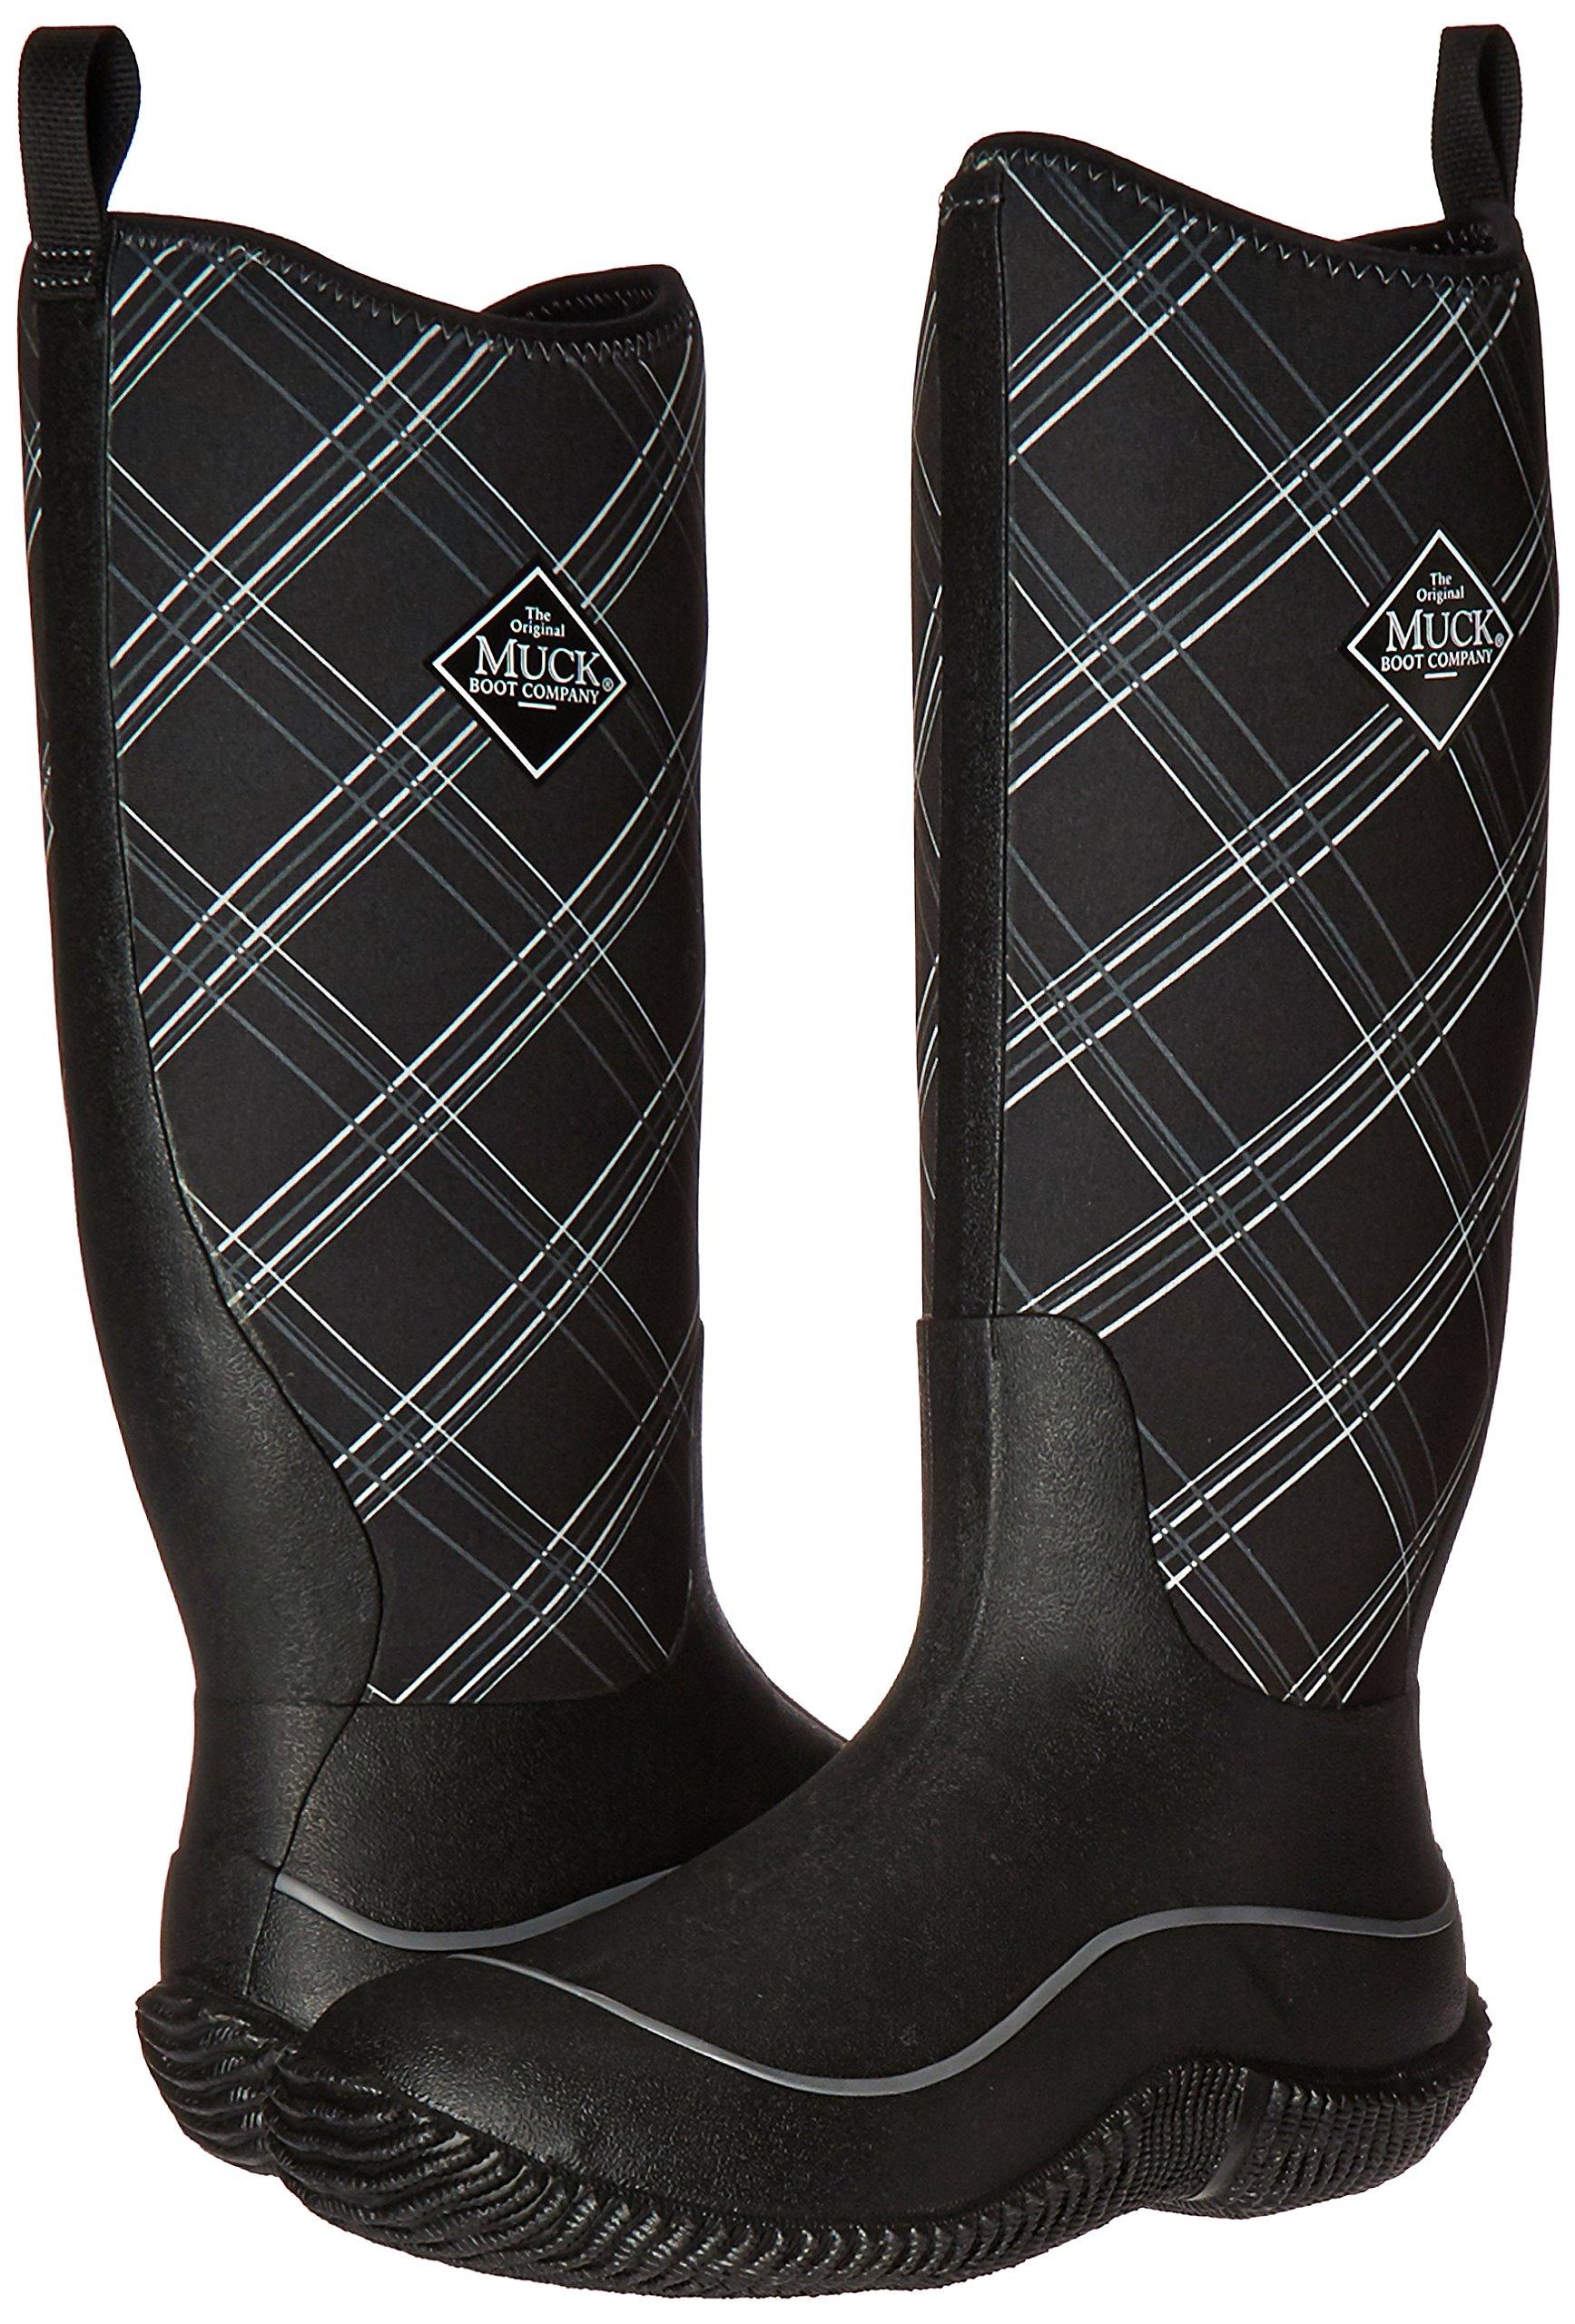 Muck Hale Multi-Season Women's Rubber Boots by Muck Boot (Image #6)